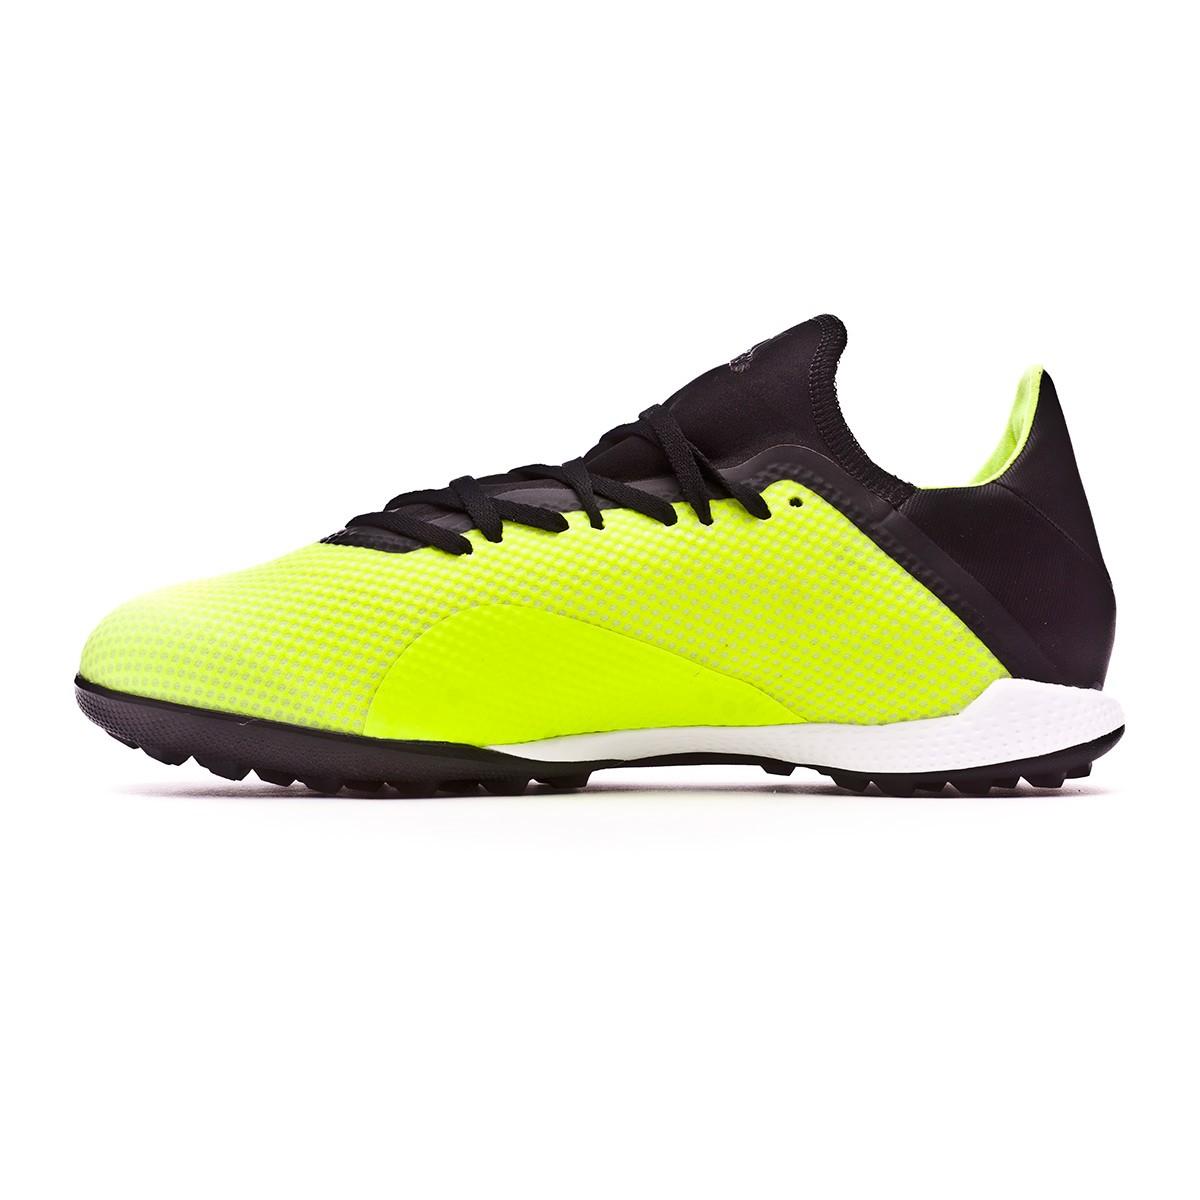 free shipping f9753 ba94a Football Boot adidas X Tango 18.3 Turf Solar yellow-Core black-White -  Football store Fútbol Emotion